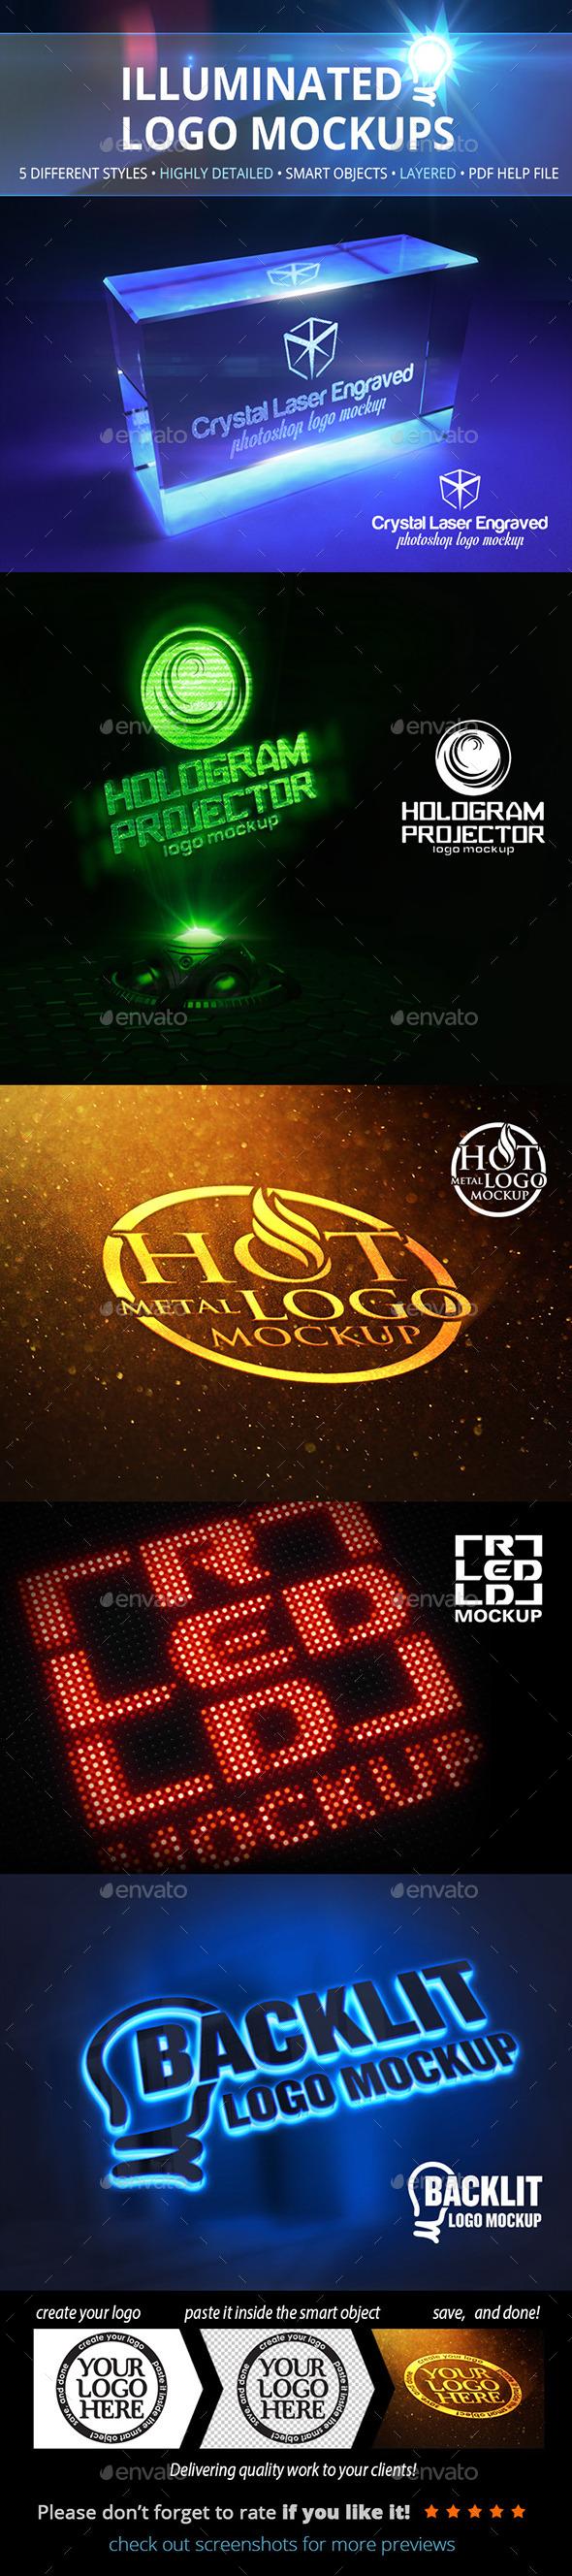 GraphicRiver Illuminated Logo Mockups 10955063